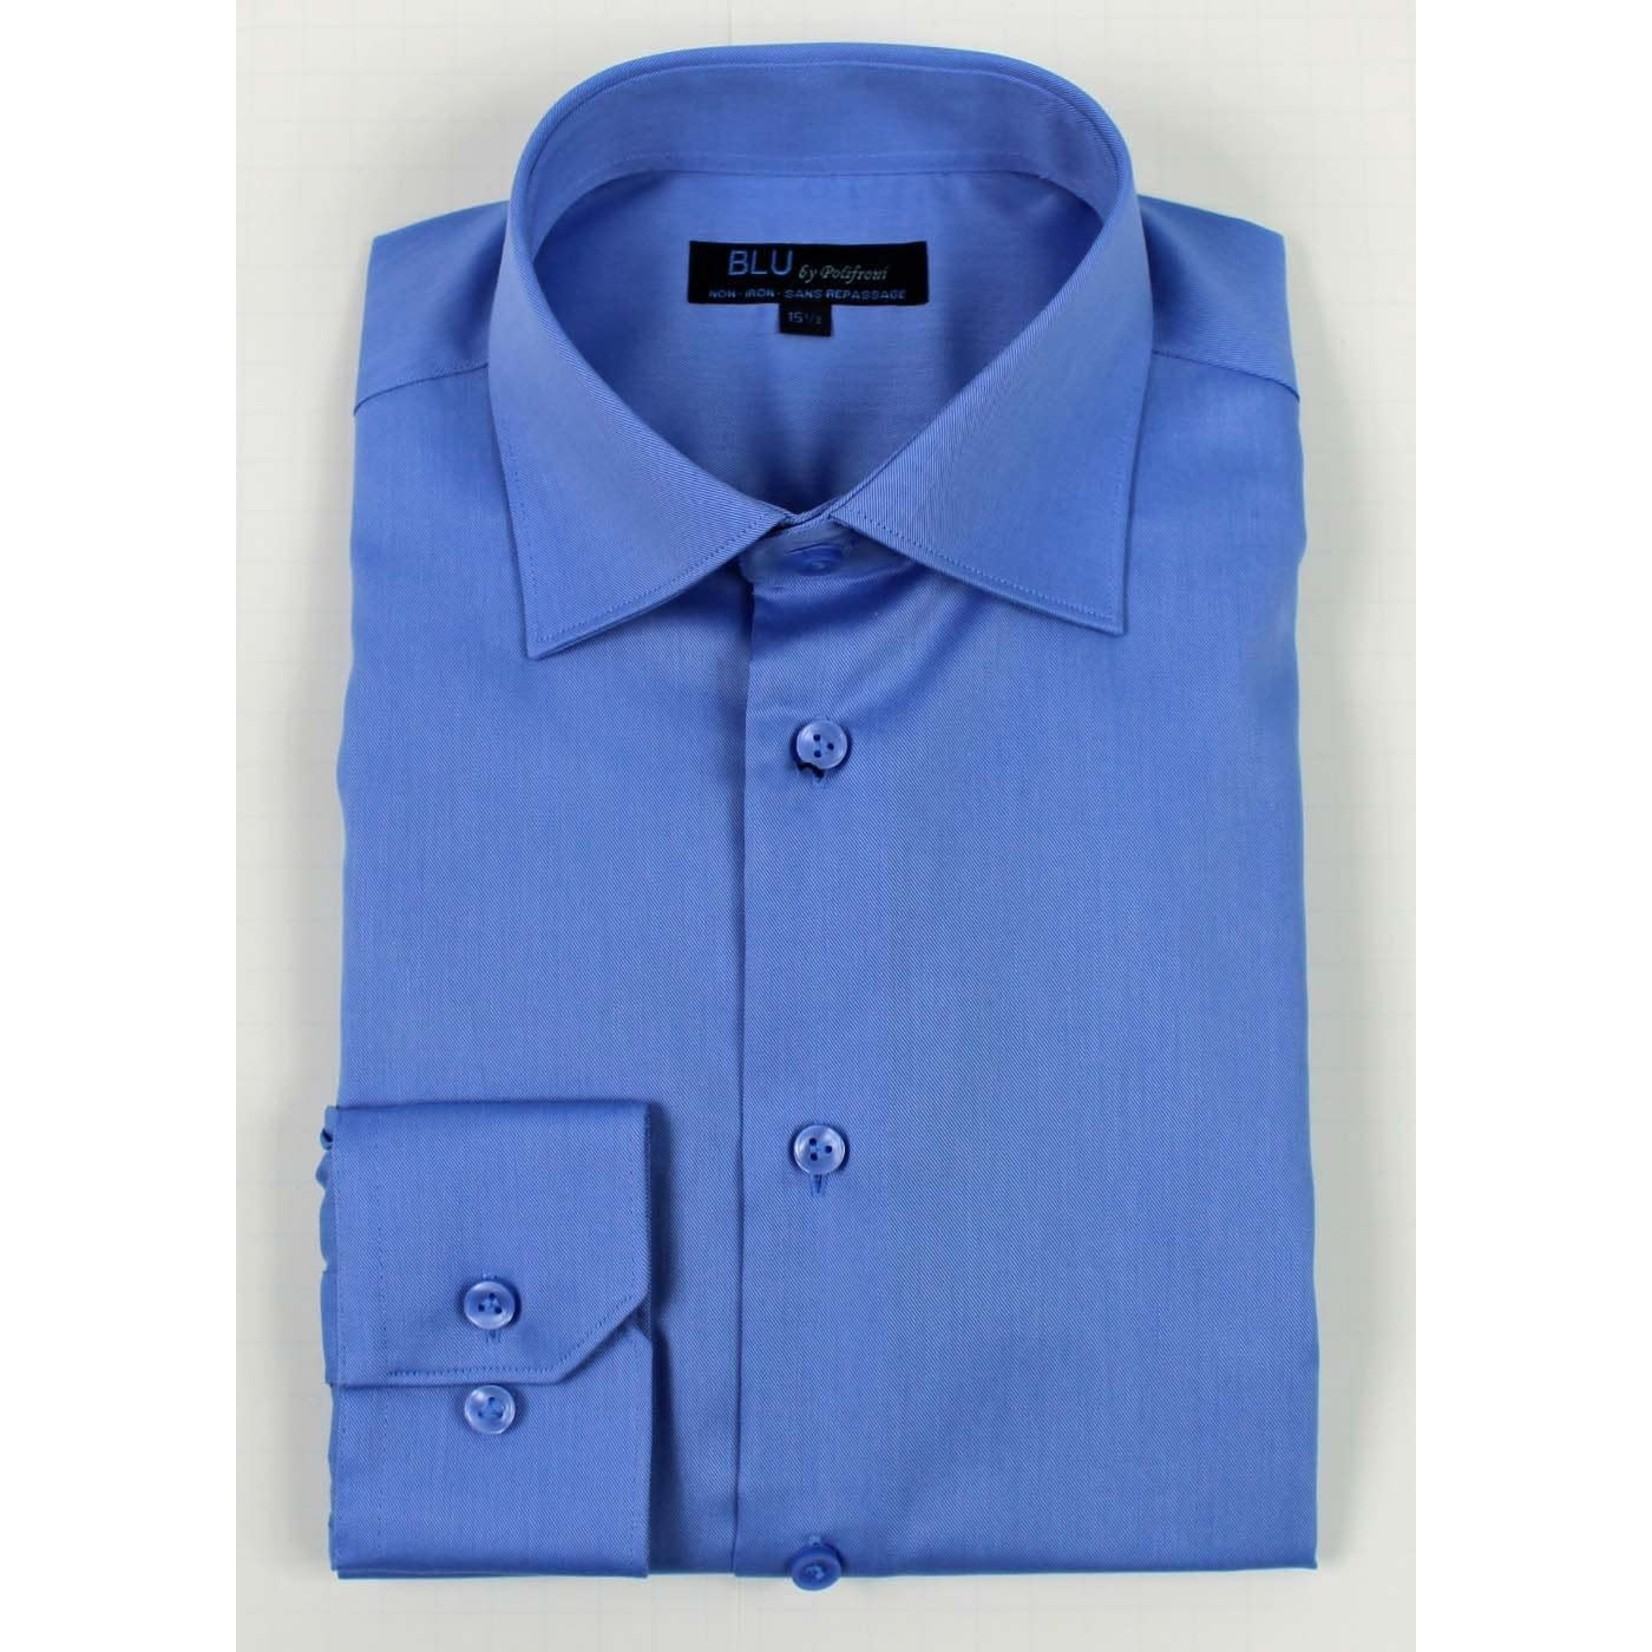 Polifroni Blu-360M Miami Non-Iron Dress Shirt 19 Mid Blue